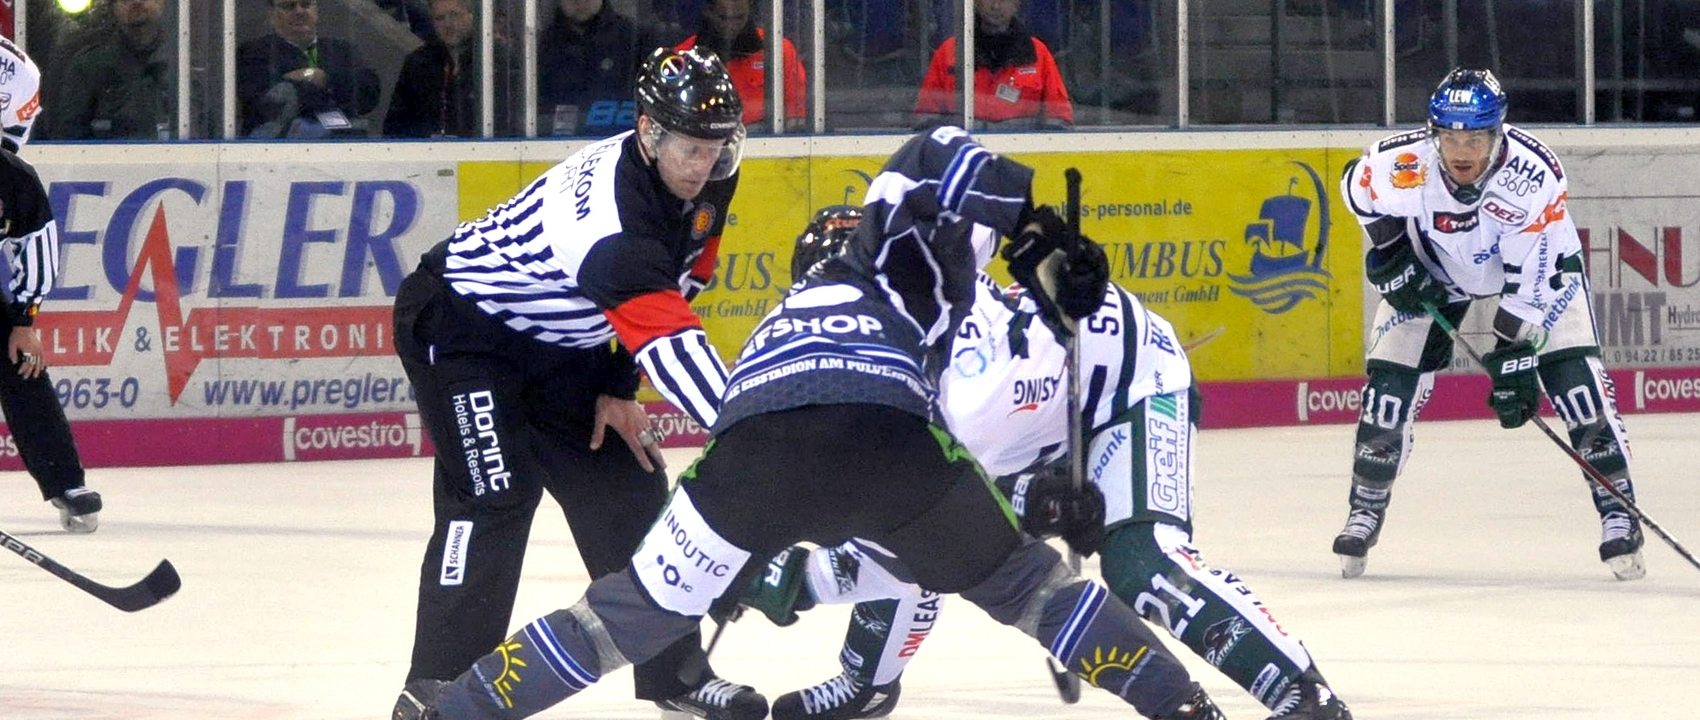 AEV verliert in Straubing